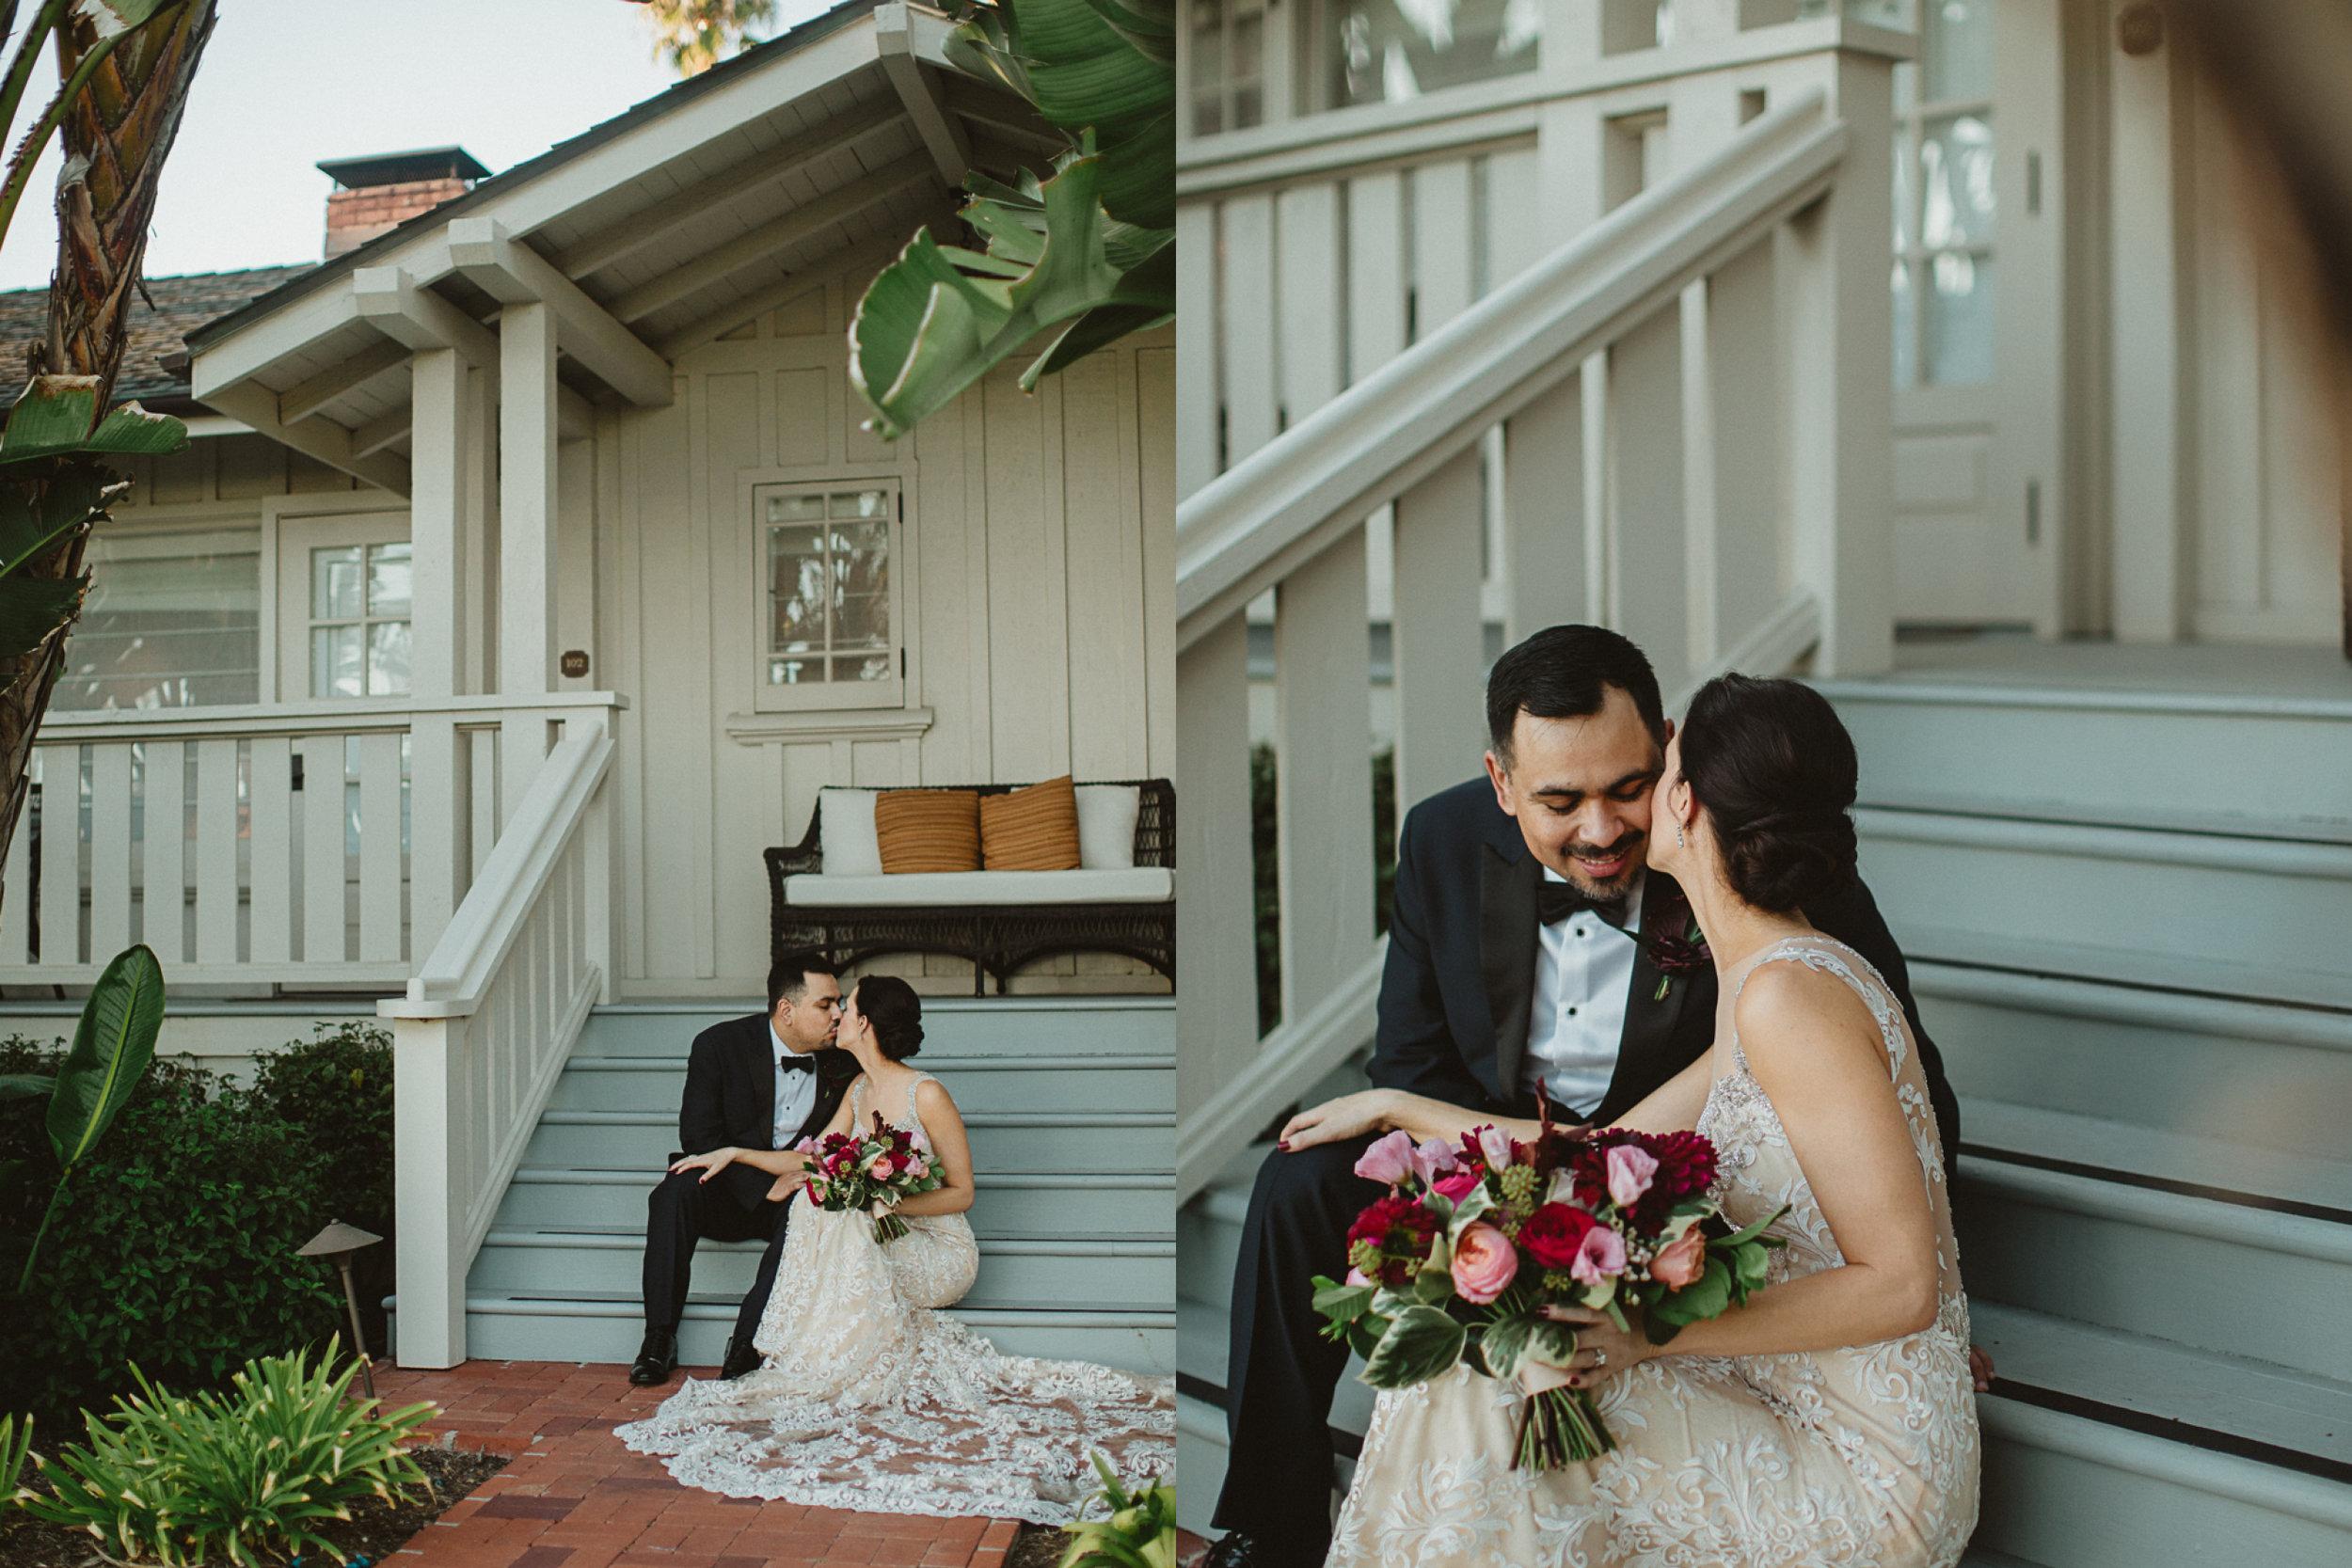 santa-barbara-elopement-elope-alegria-design-event-planner-coordinator-day-of-el-encanto-resort-lily-pond-wedding-intimate-red-maroon-city-ocean-view-rooftop (22).jpg